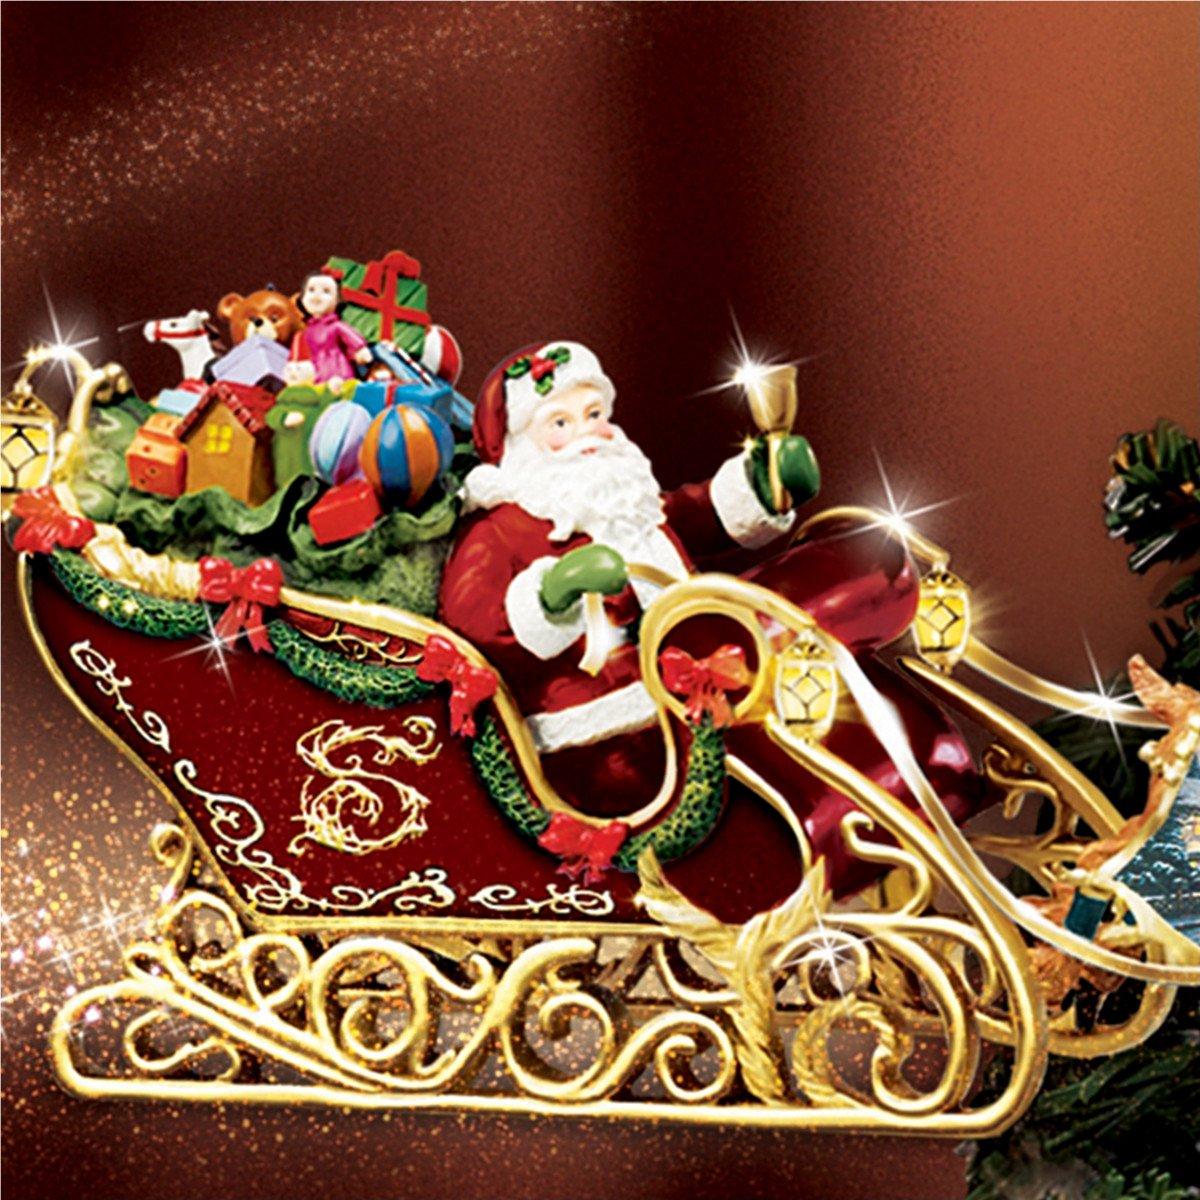 Bradford christmas ornaments - Amazon Com Thomas Kinkade Holidays In Motion Rotating Illuminated Treetopper Animated Christmas Decor By The Bradford Editions Home Kitchen